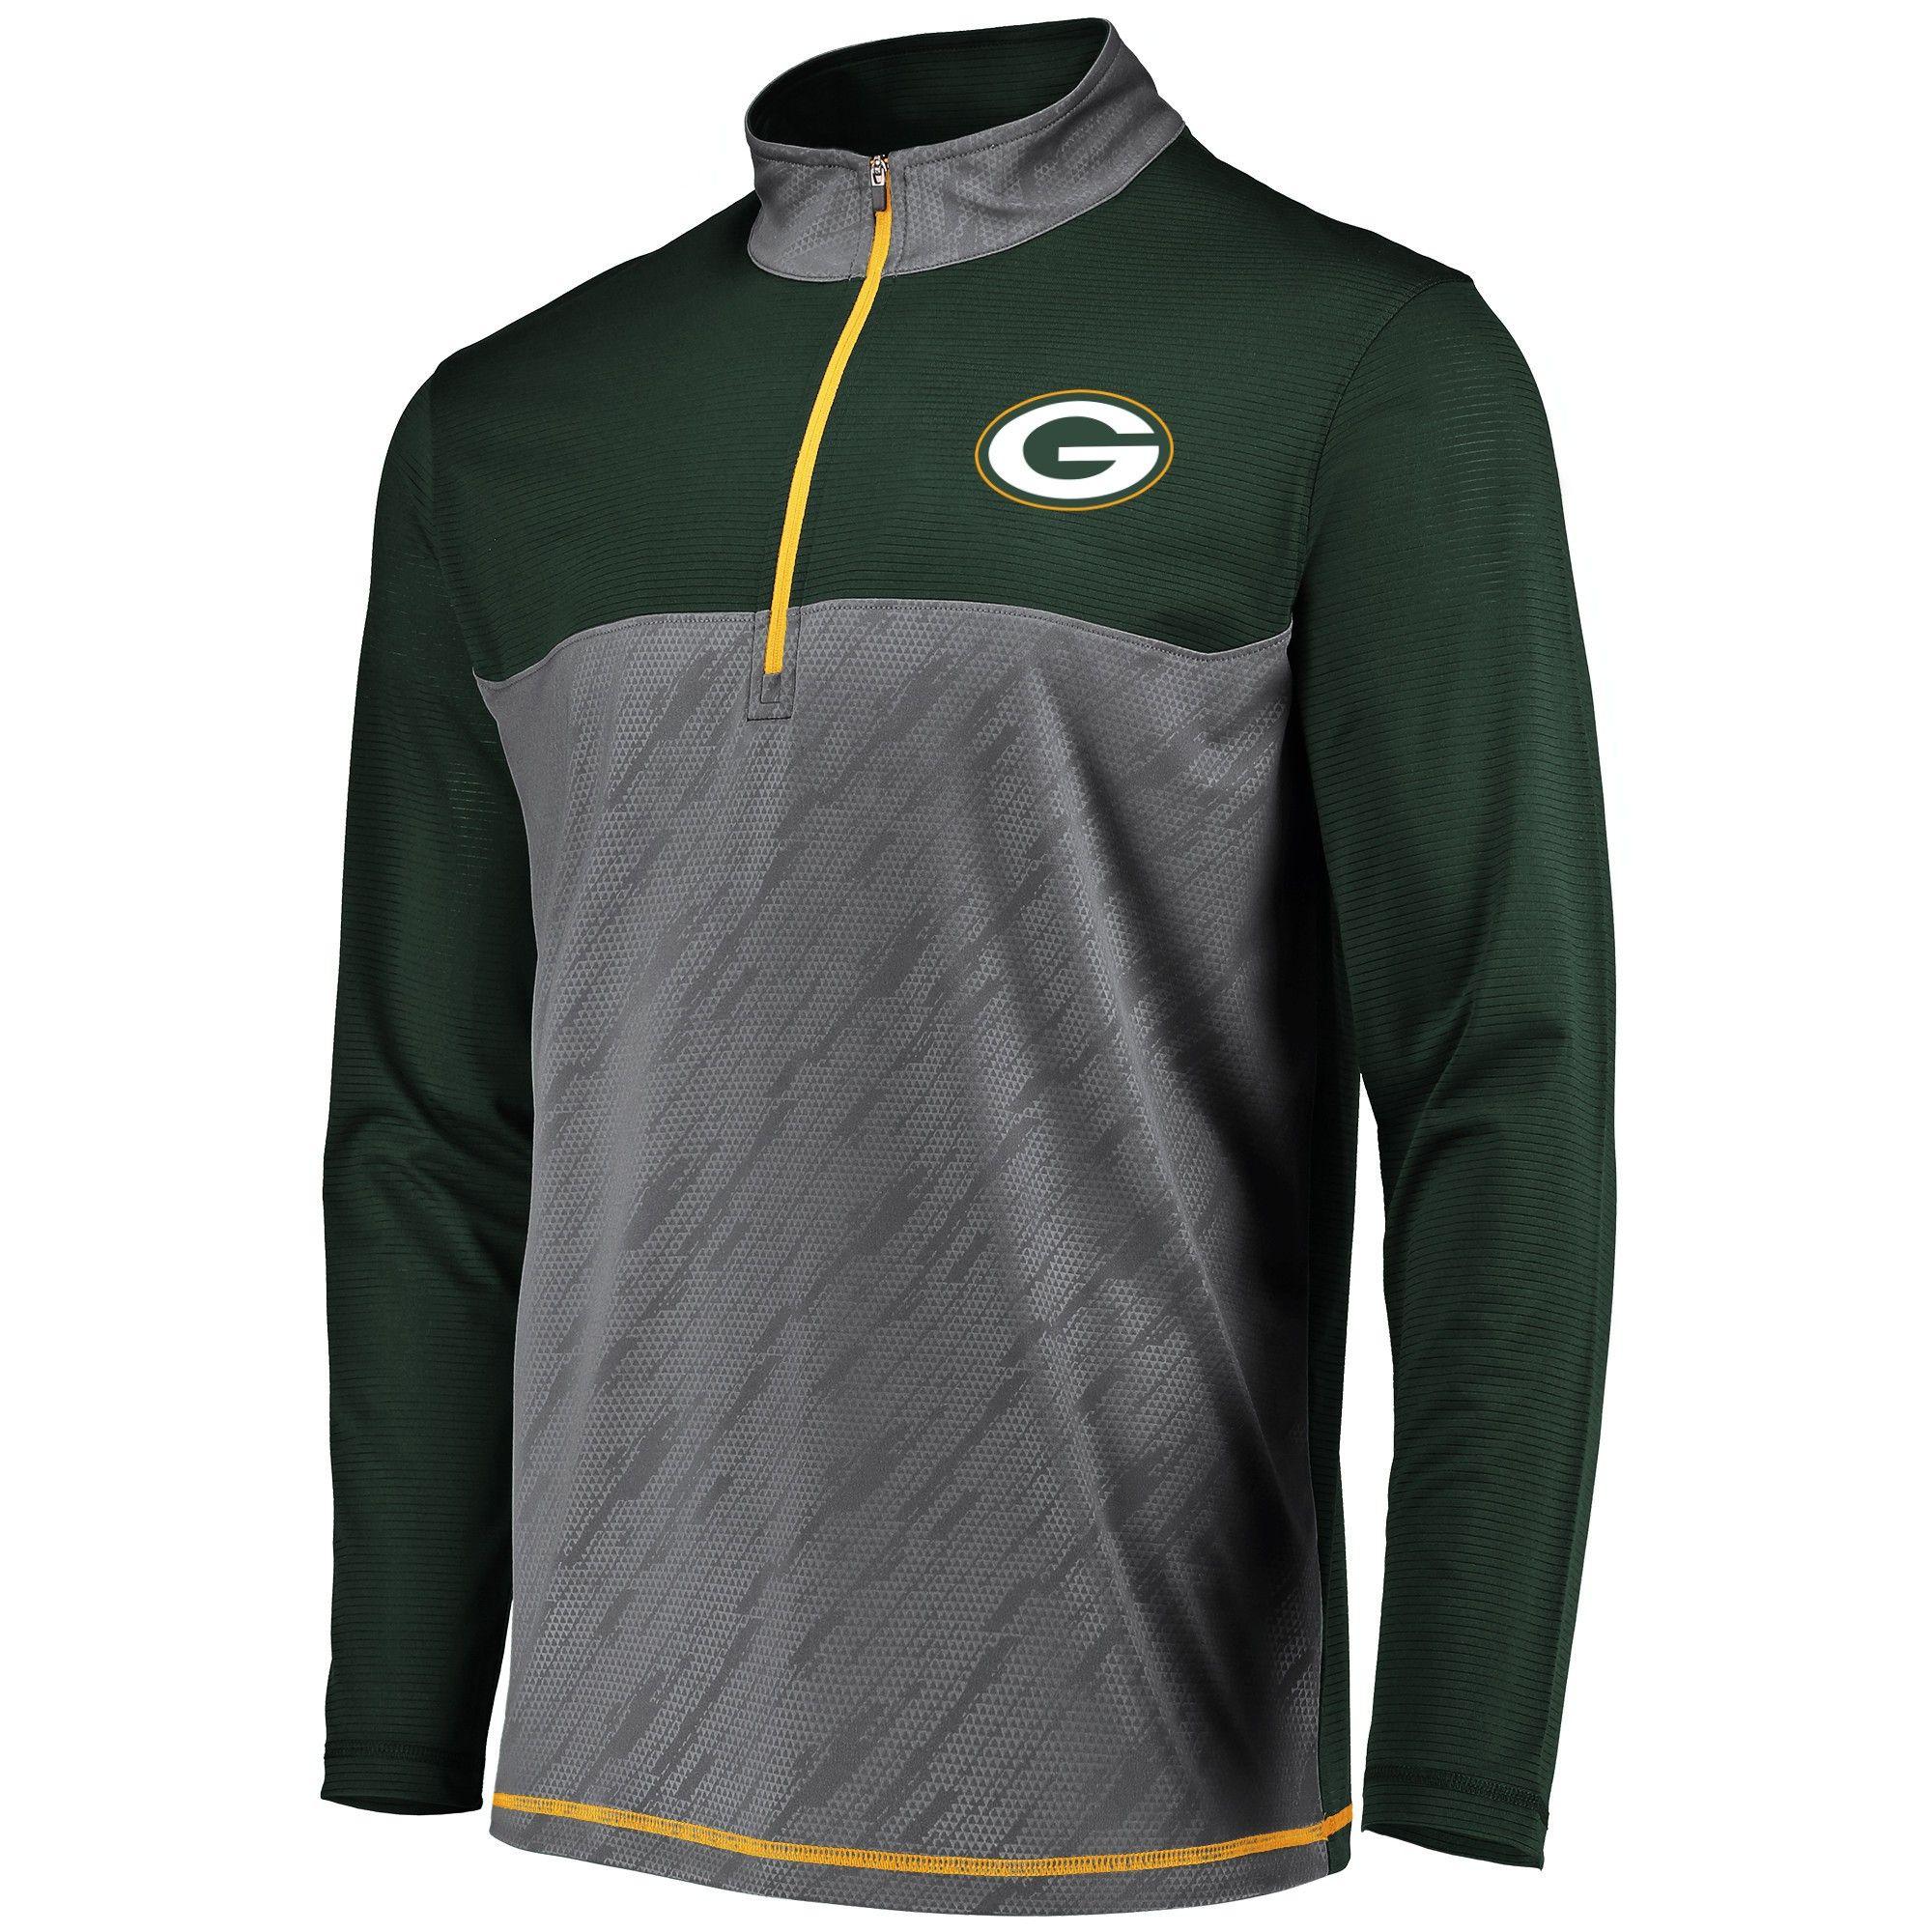 83a5d76d4 Green Bay Packers Men s Striped Geo Fuse  Gray 1 2 Zip Xxl ...